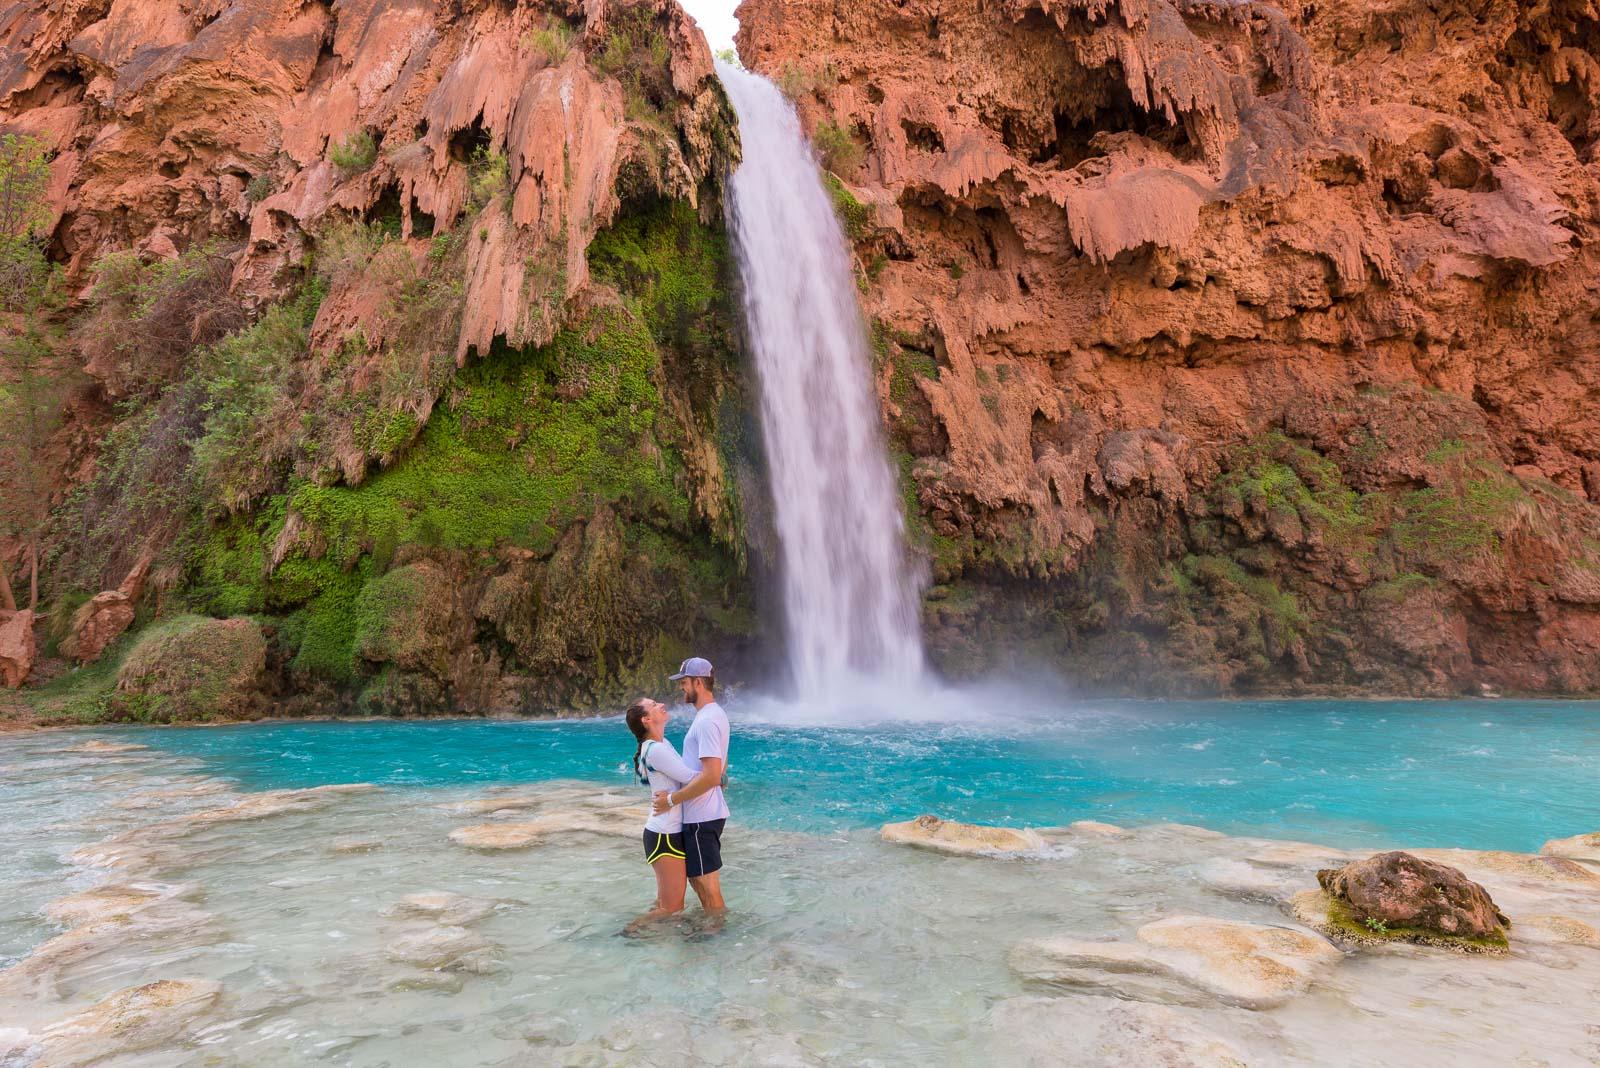 The Turquoise Oasis of Havasu Falls, Arizona